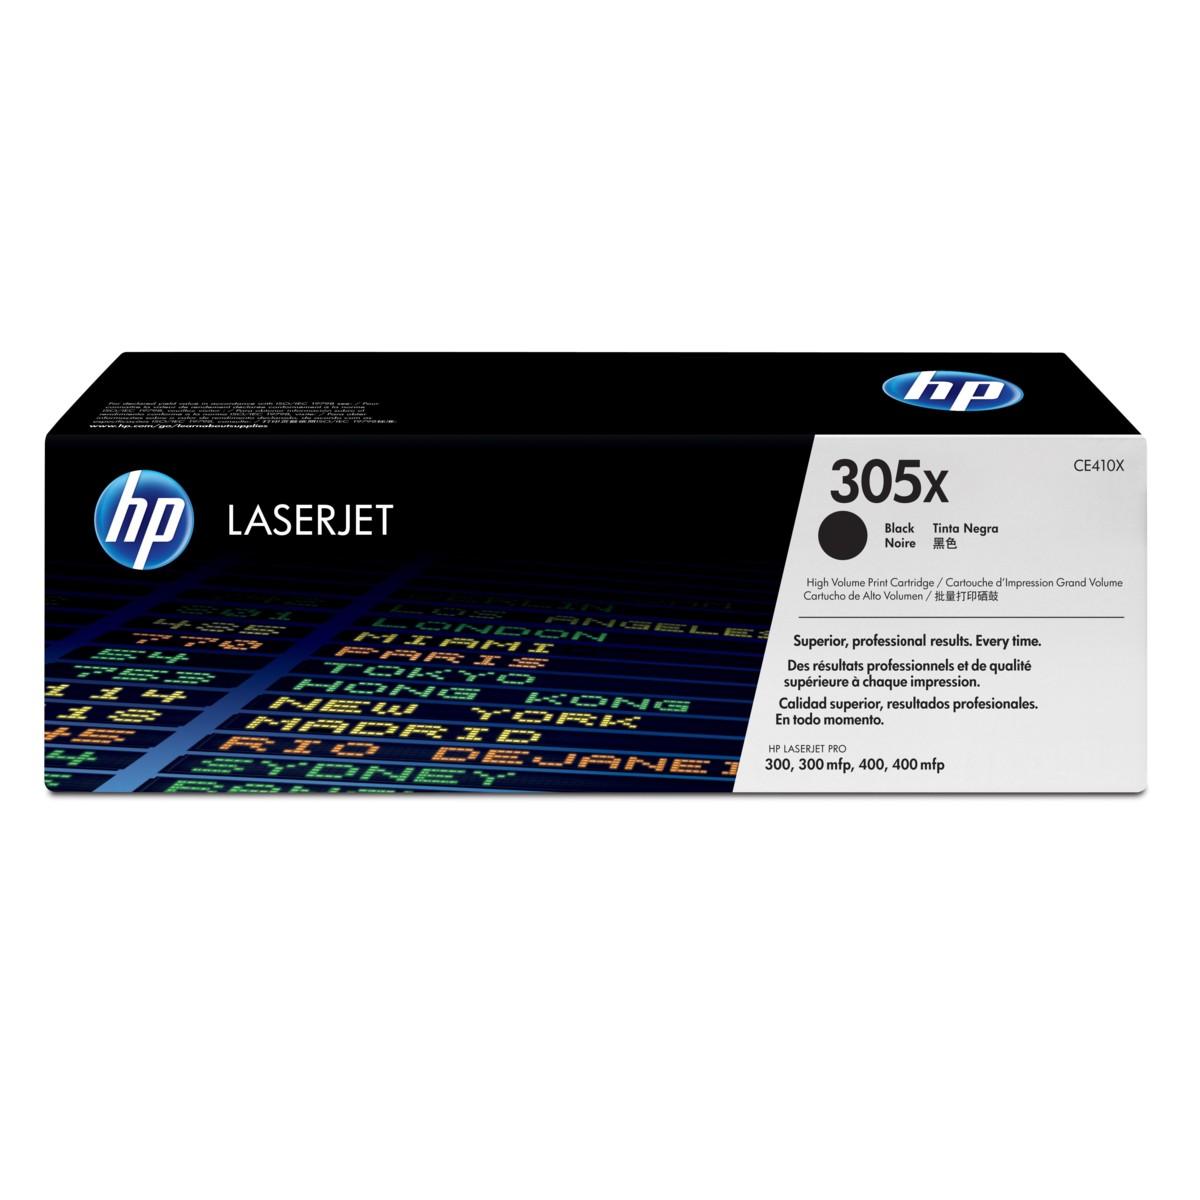 Toner HP 305X, HP CE410X - originálný (Čierny)